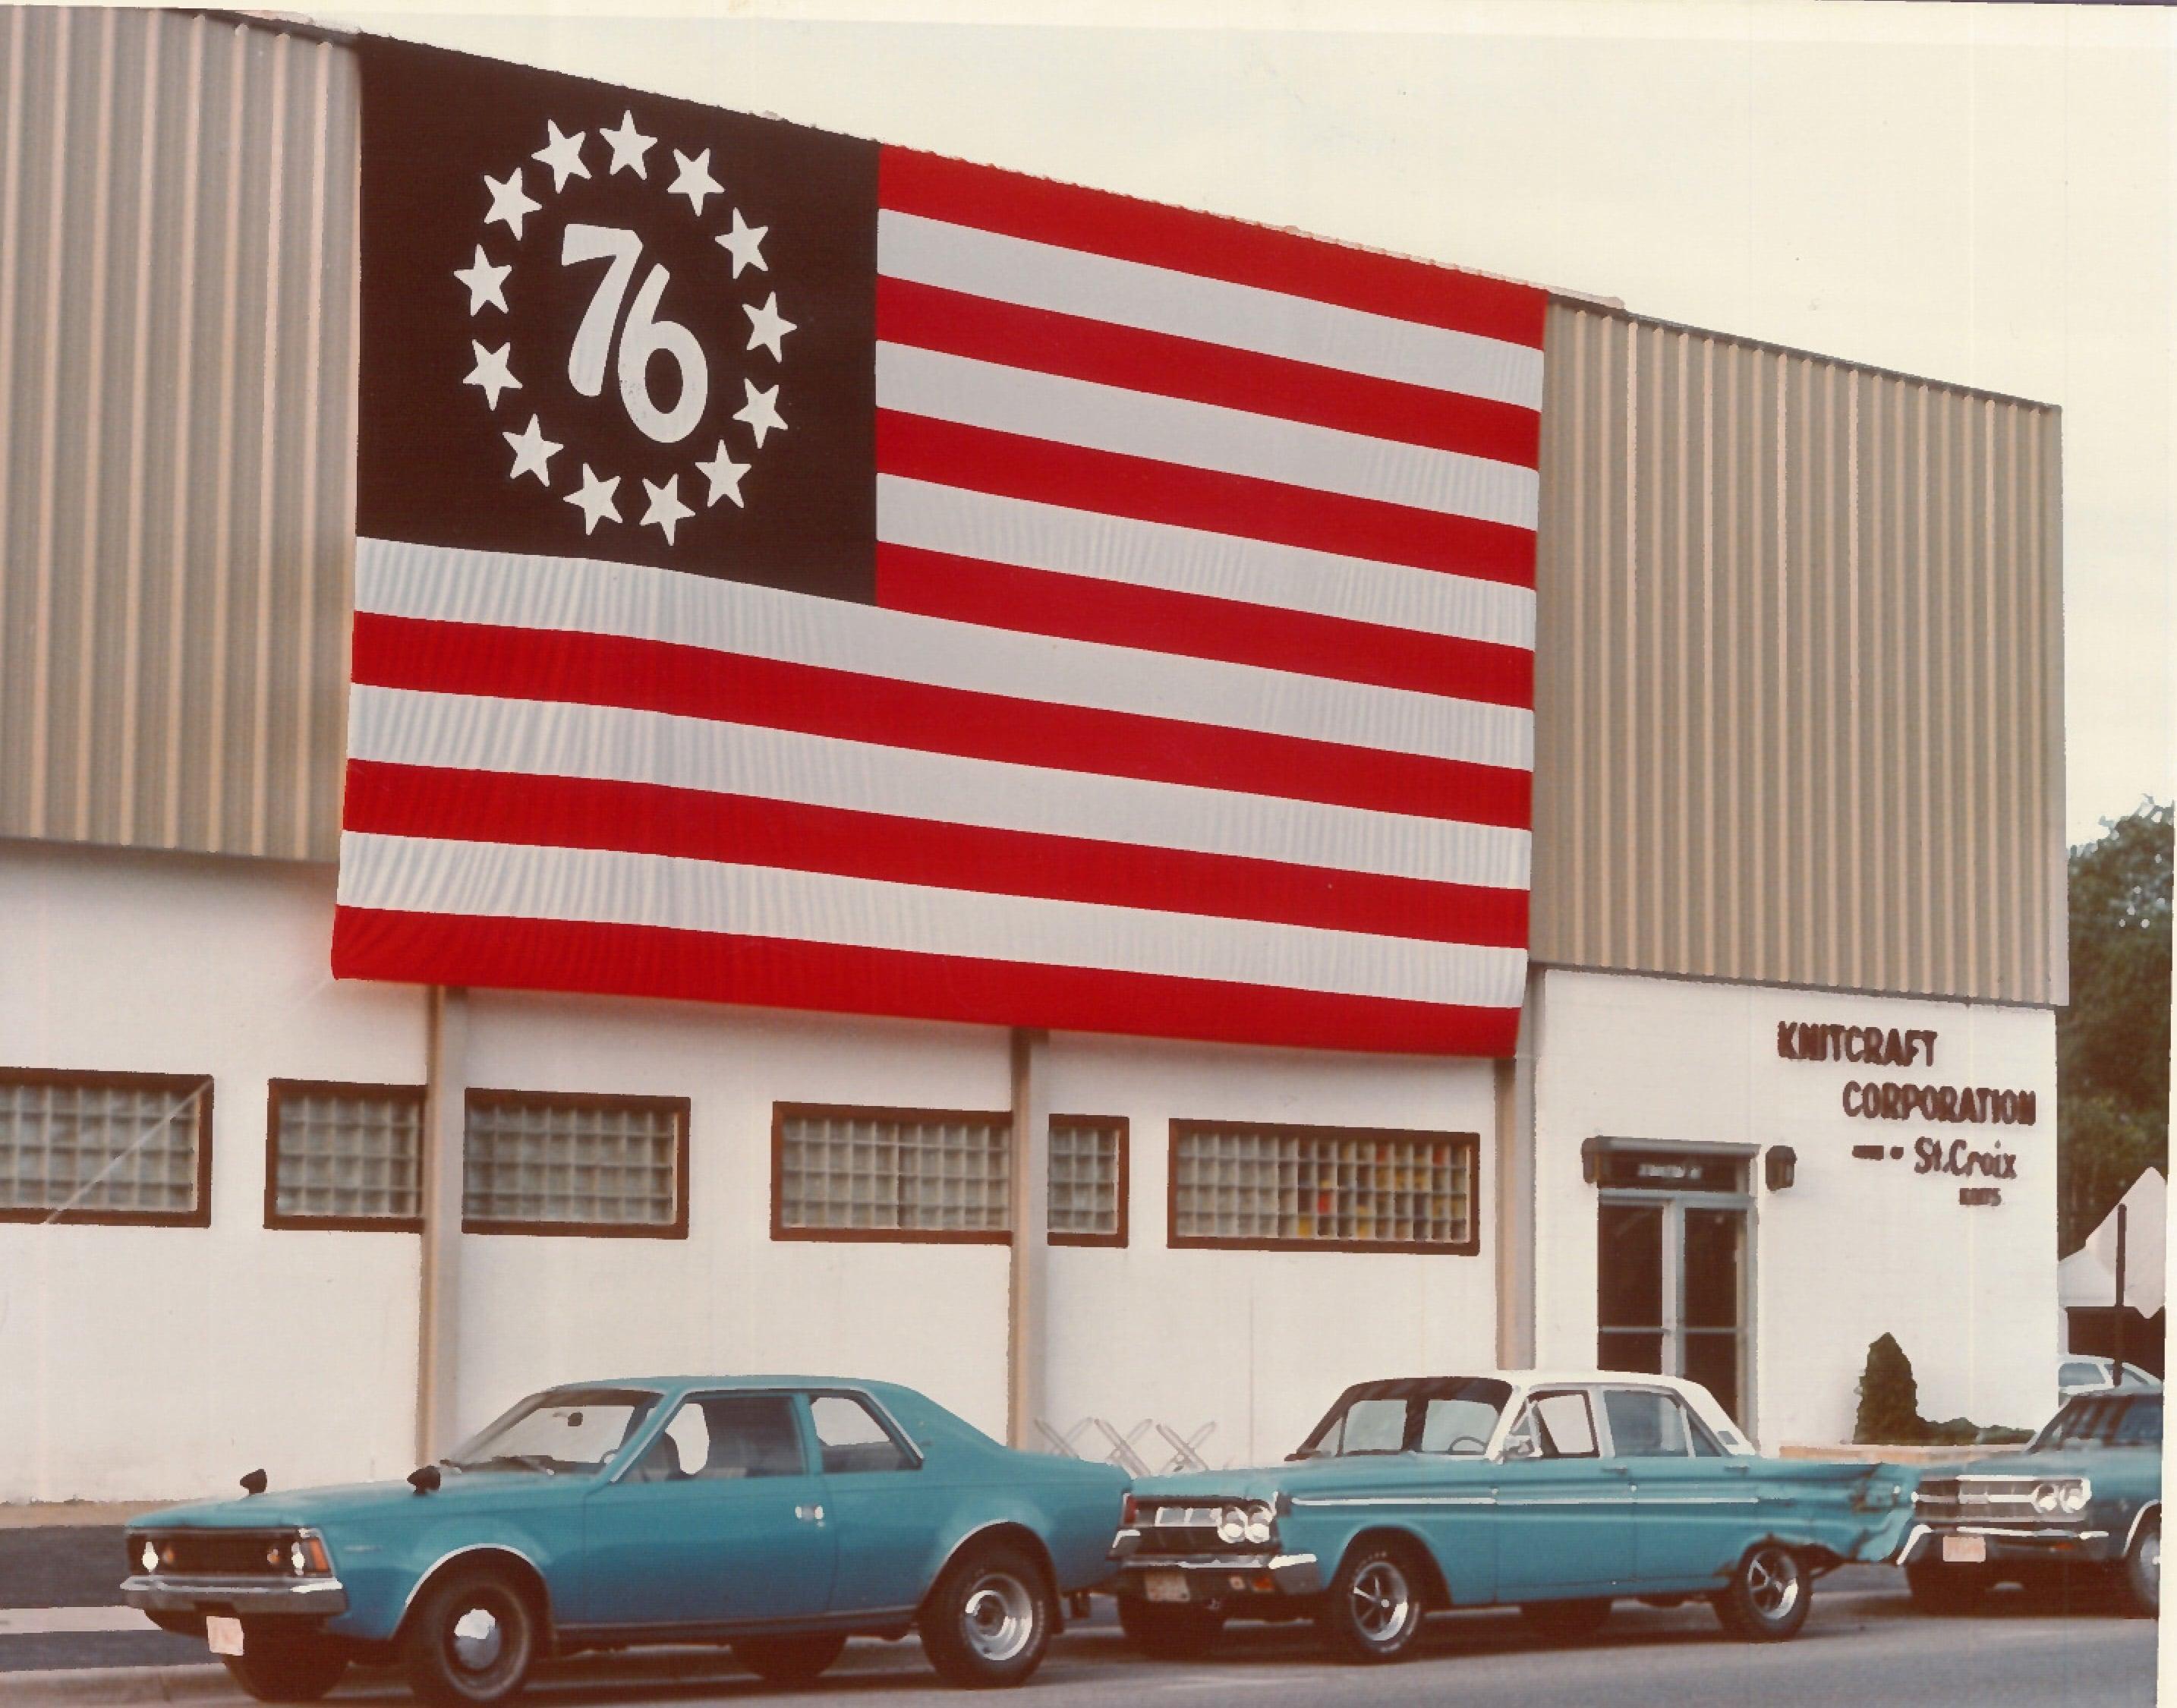 Color flag on building copy 2